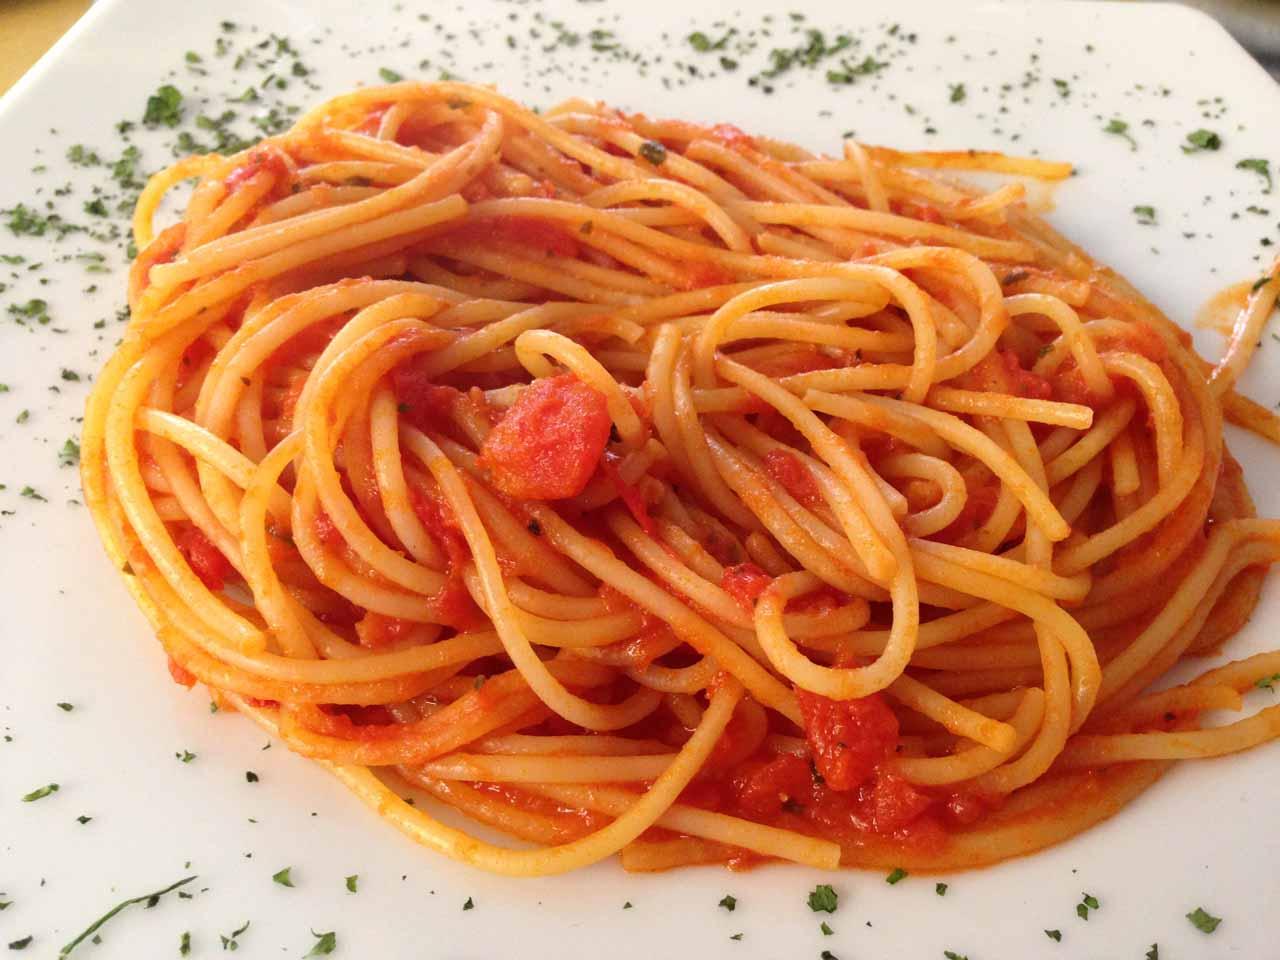 The spaghetti pomodoro